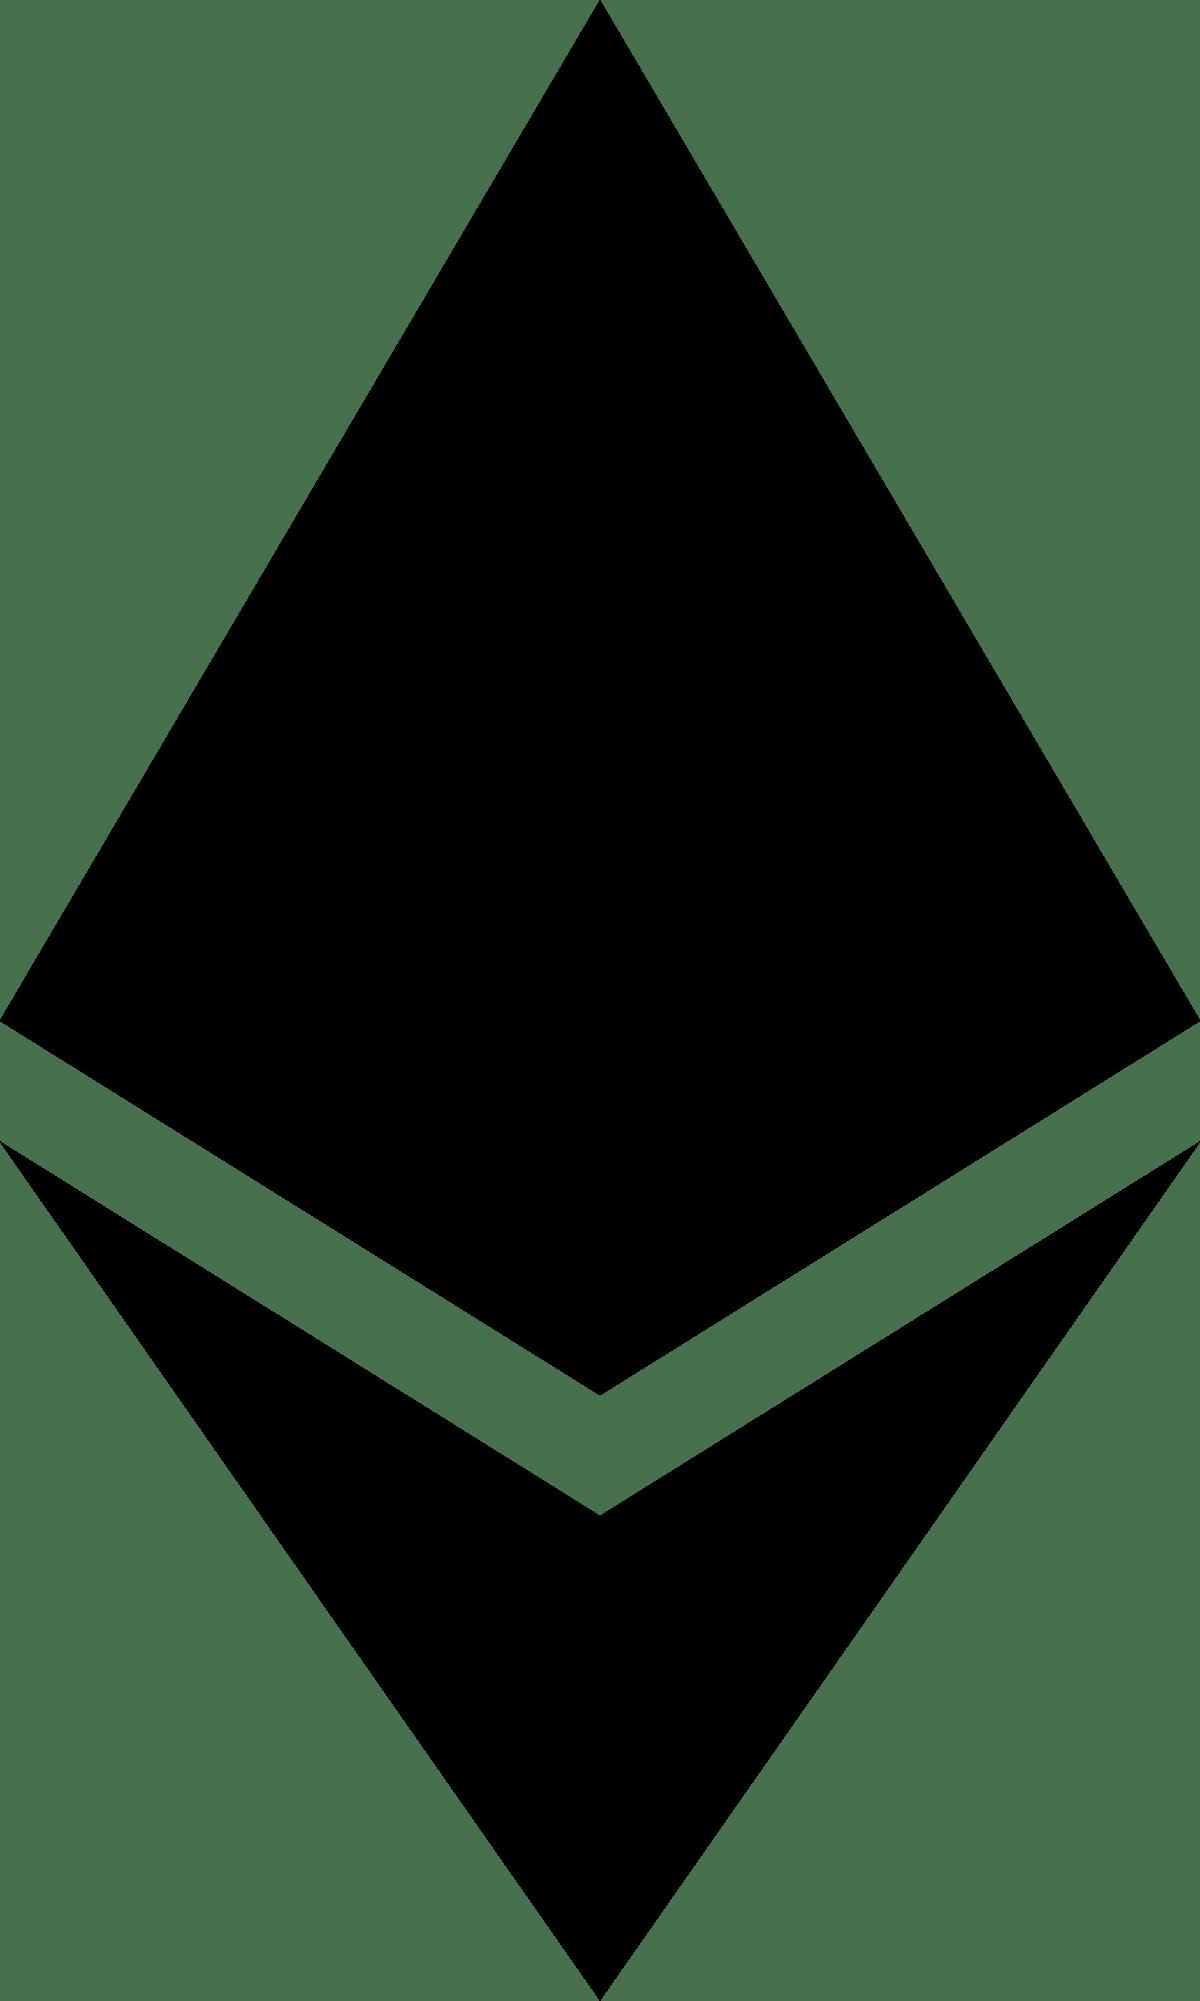 ETH Diamond Glyph